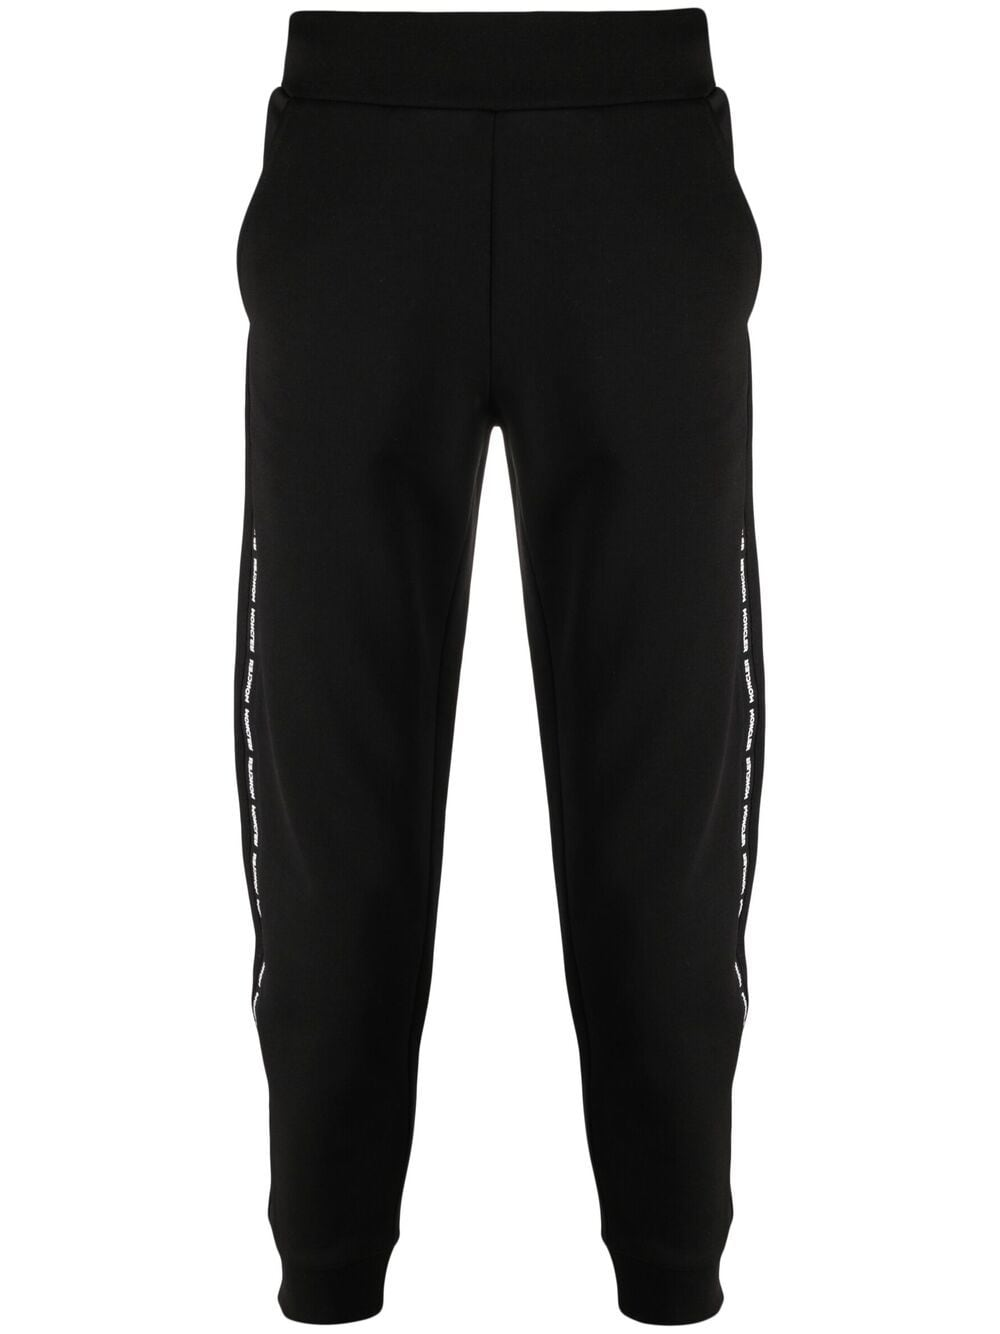 Pantaloni sportivi in cotone nero con pannelli laterali decorati con logo Moncler MONCLER | Pantaloni | 8H732-00-809KR999